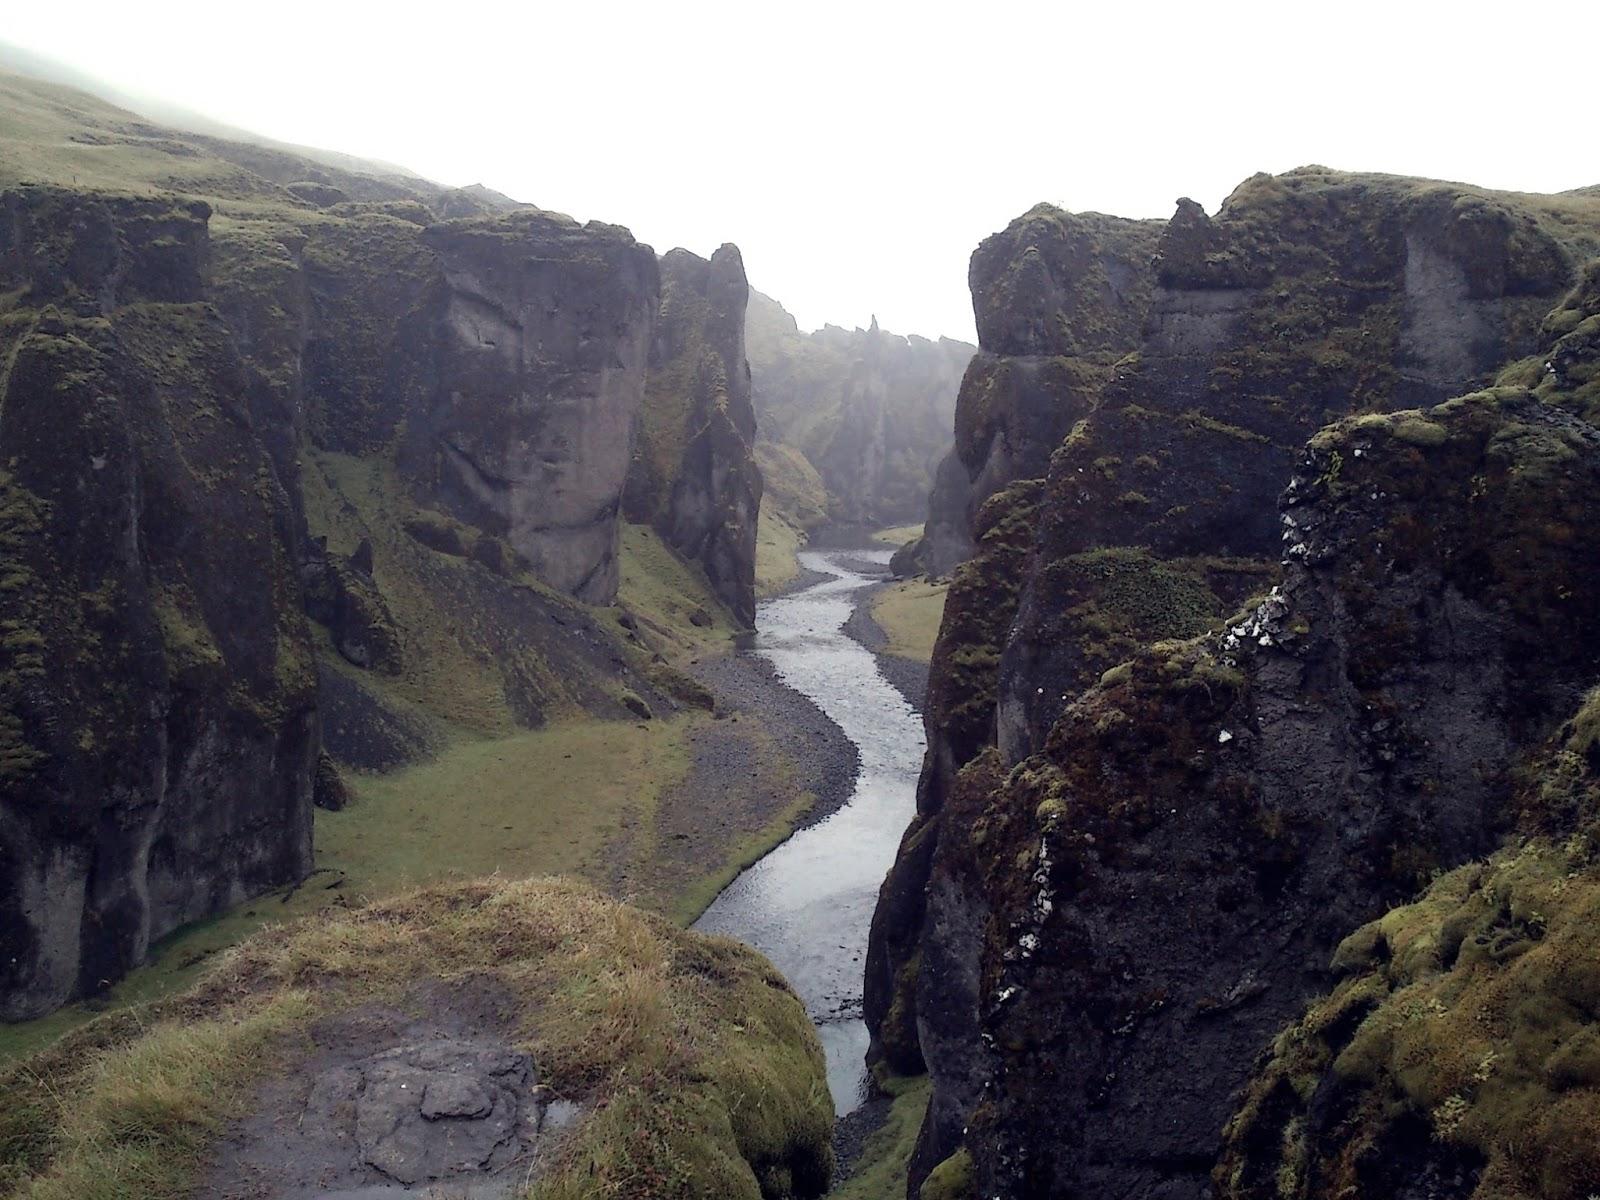 fjaðrárgljúfur, kanion, canyon, Islandia, południowa Islandia, atrakcje Islandii